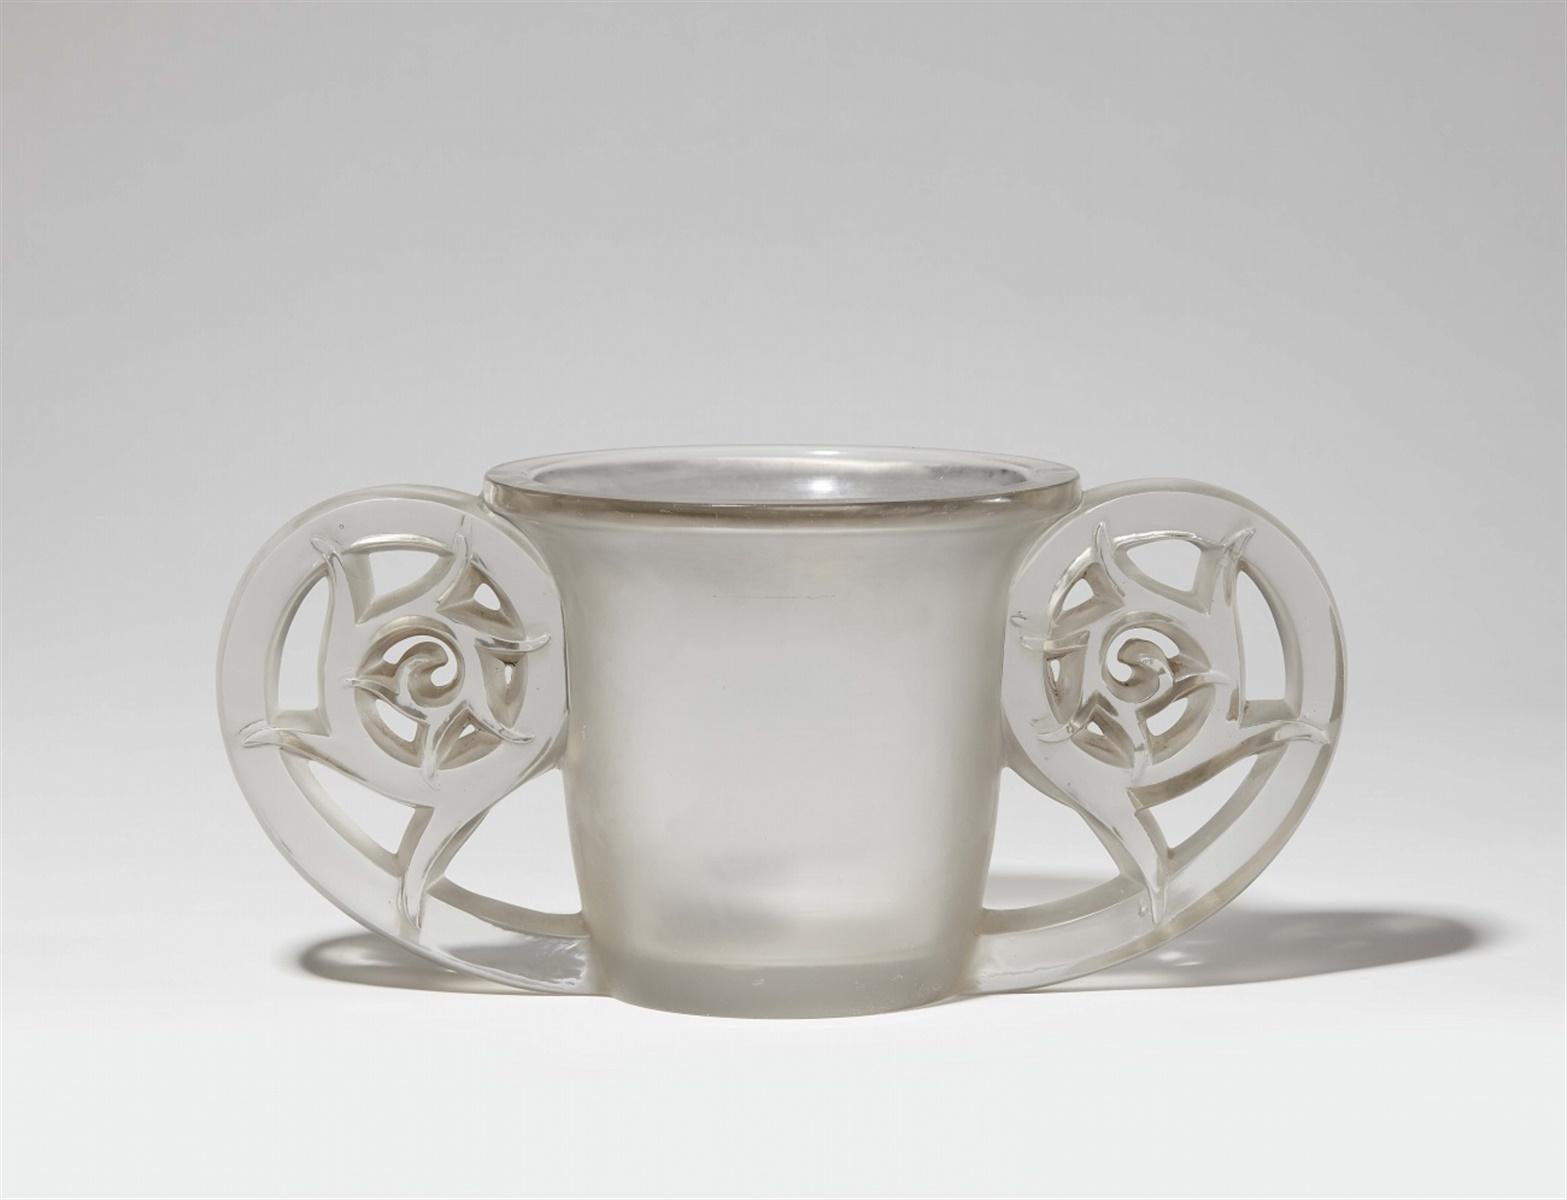 Vase PierrefondsModelgeformtes Klarglas, partiell matt geätzt, angeschmolzene Griffe. Modell 990.